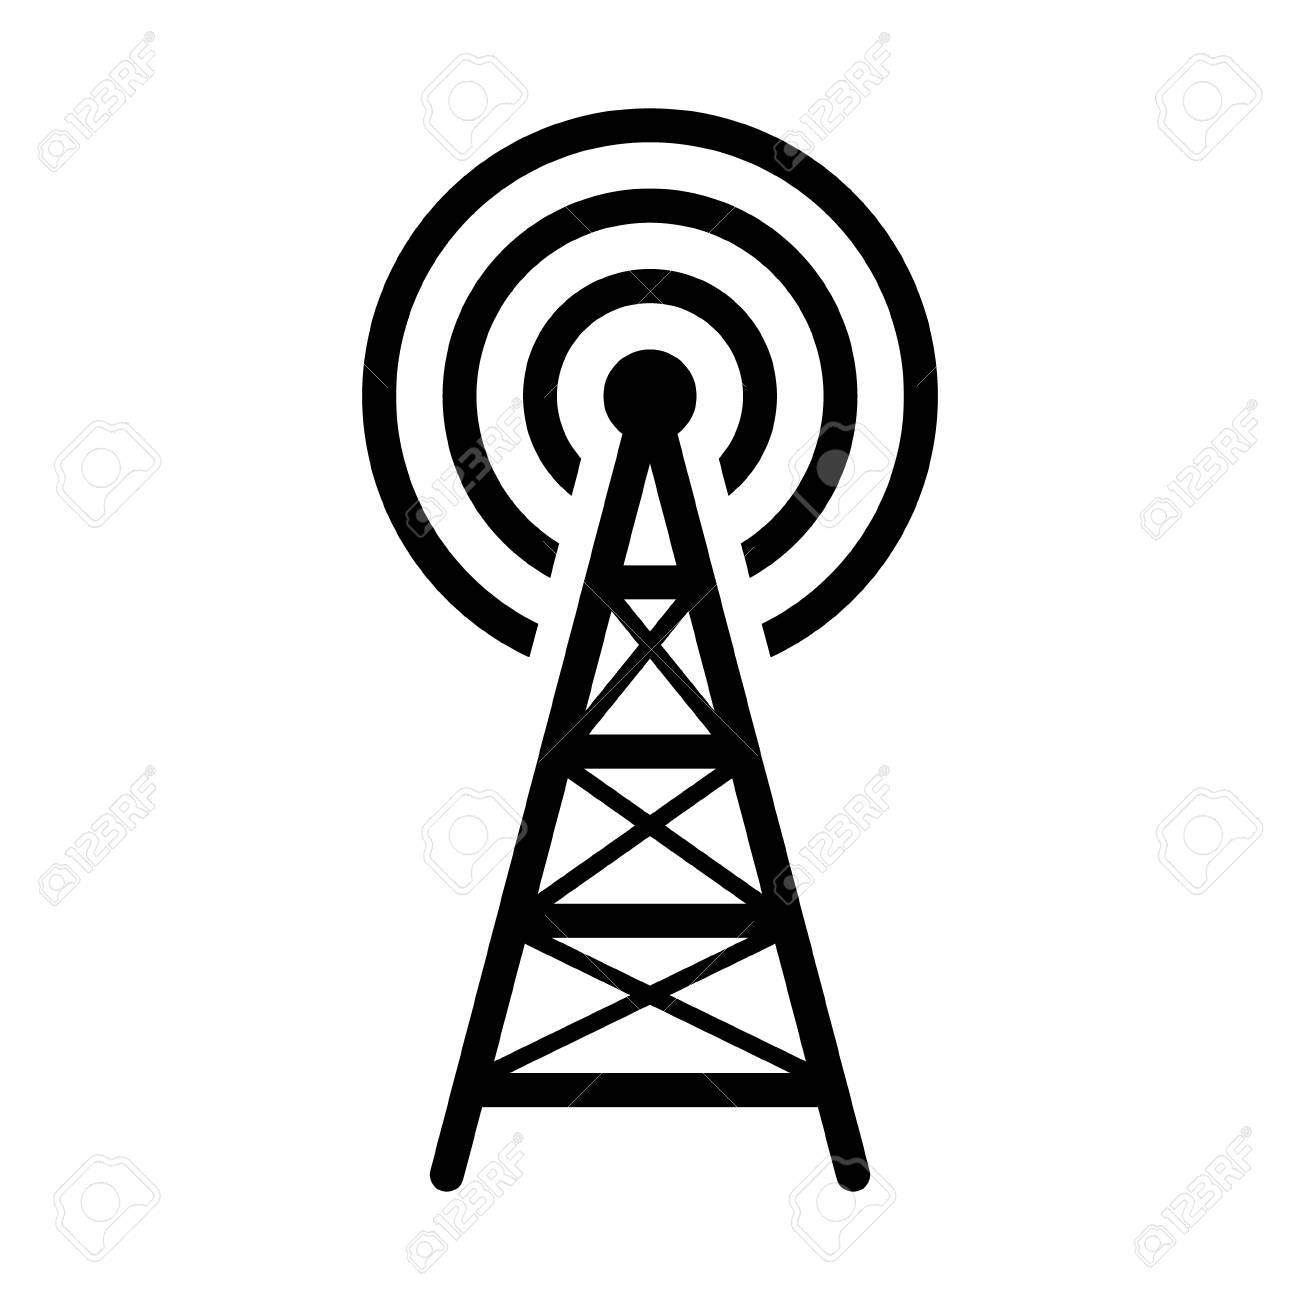 Radio tower, mast with radio waves for broadcast transmission